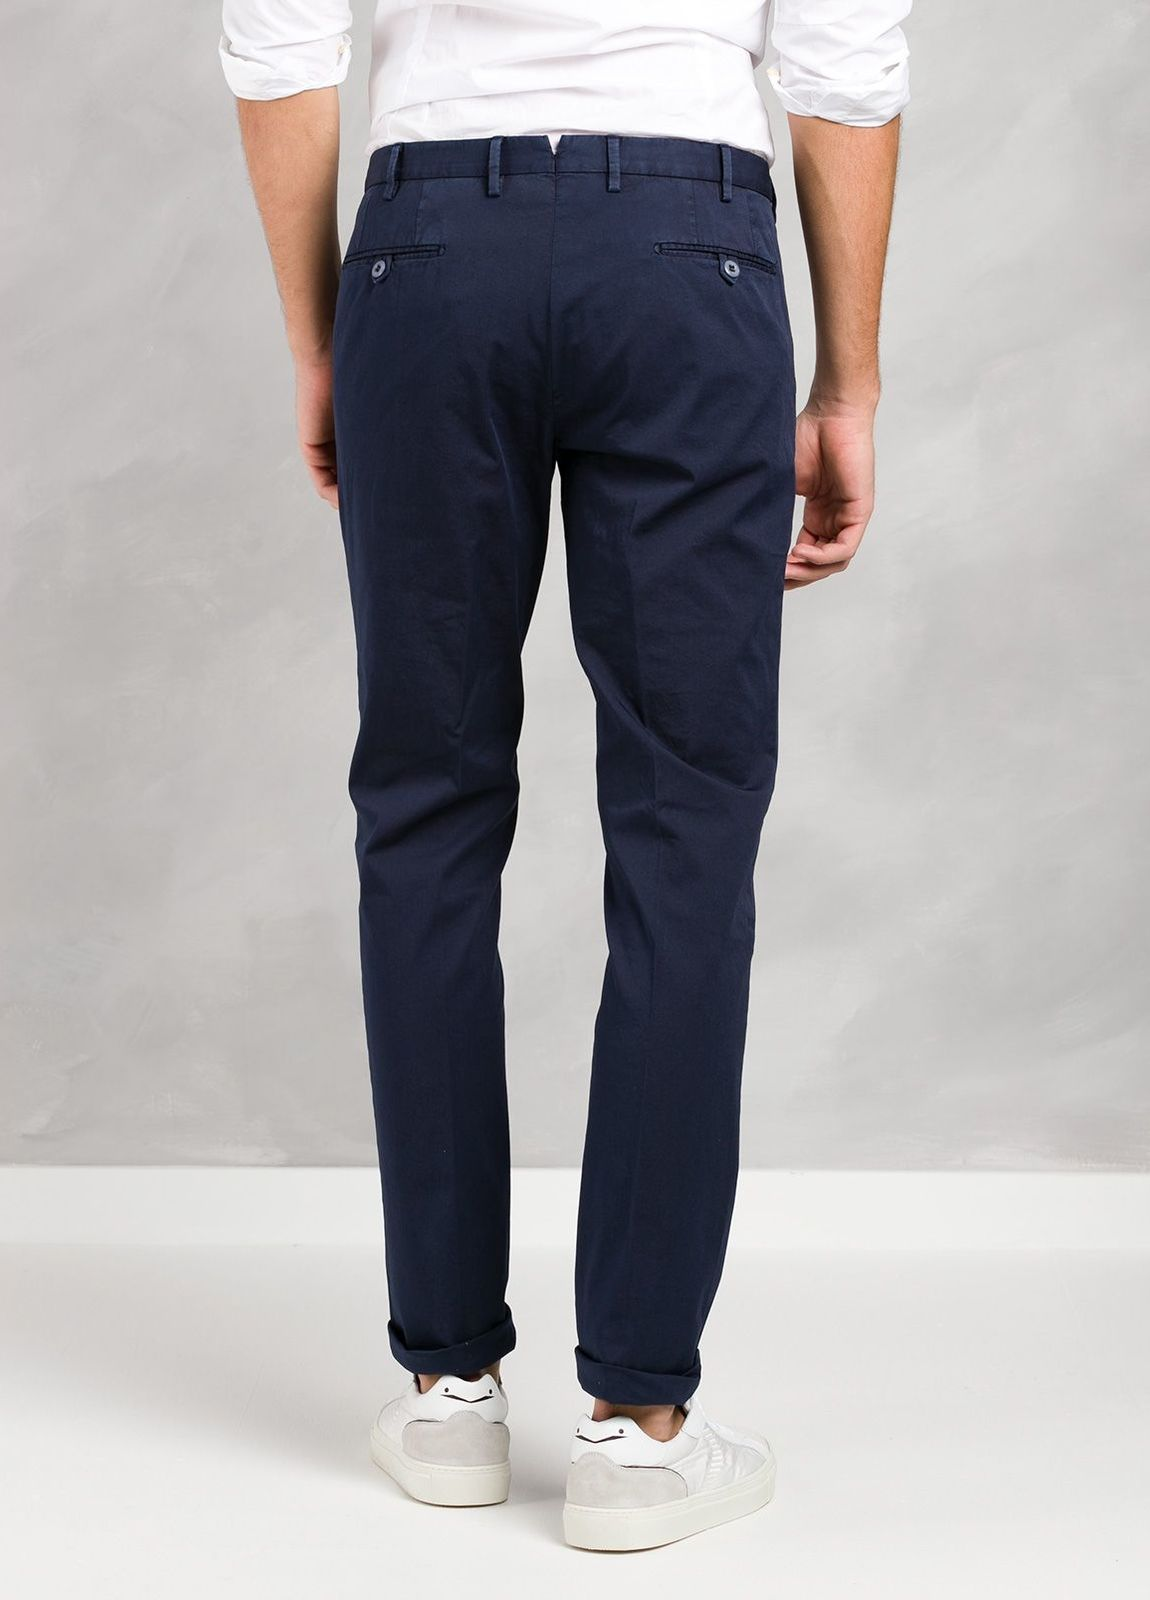 Pantalón chino modelo BWWT color azul marino, algodón gabardina delavada. - Ítem2